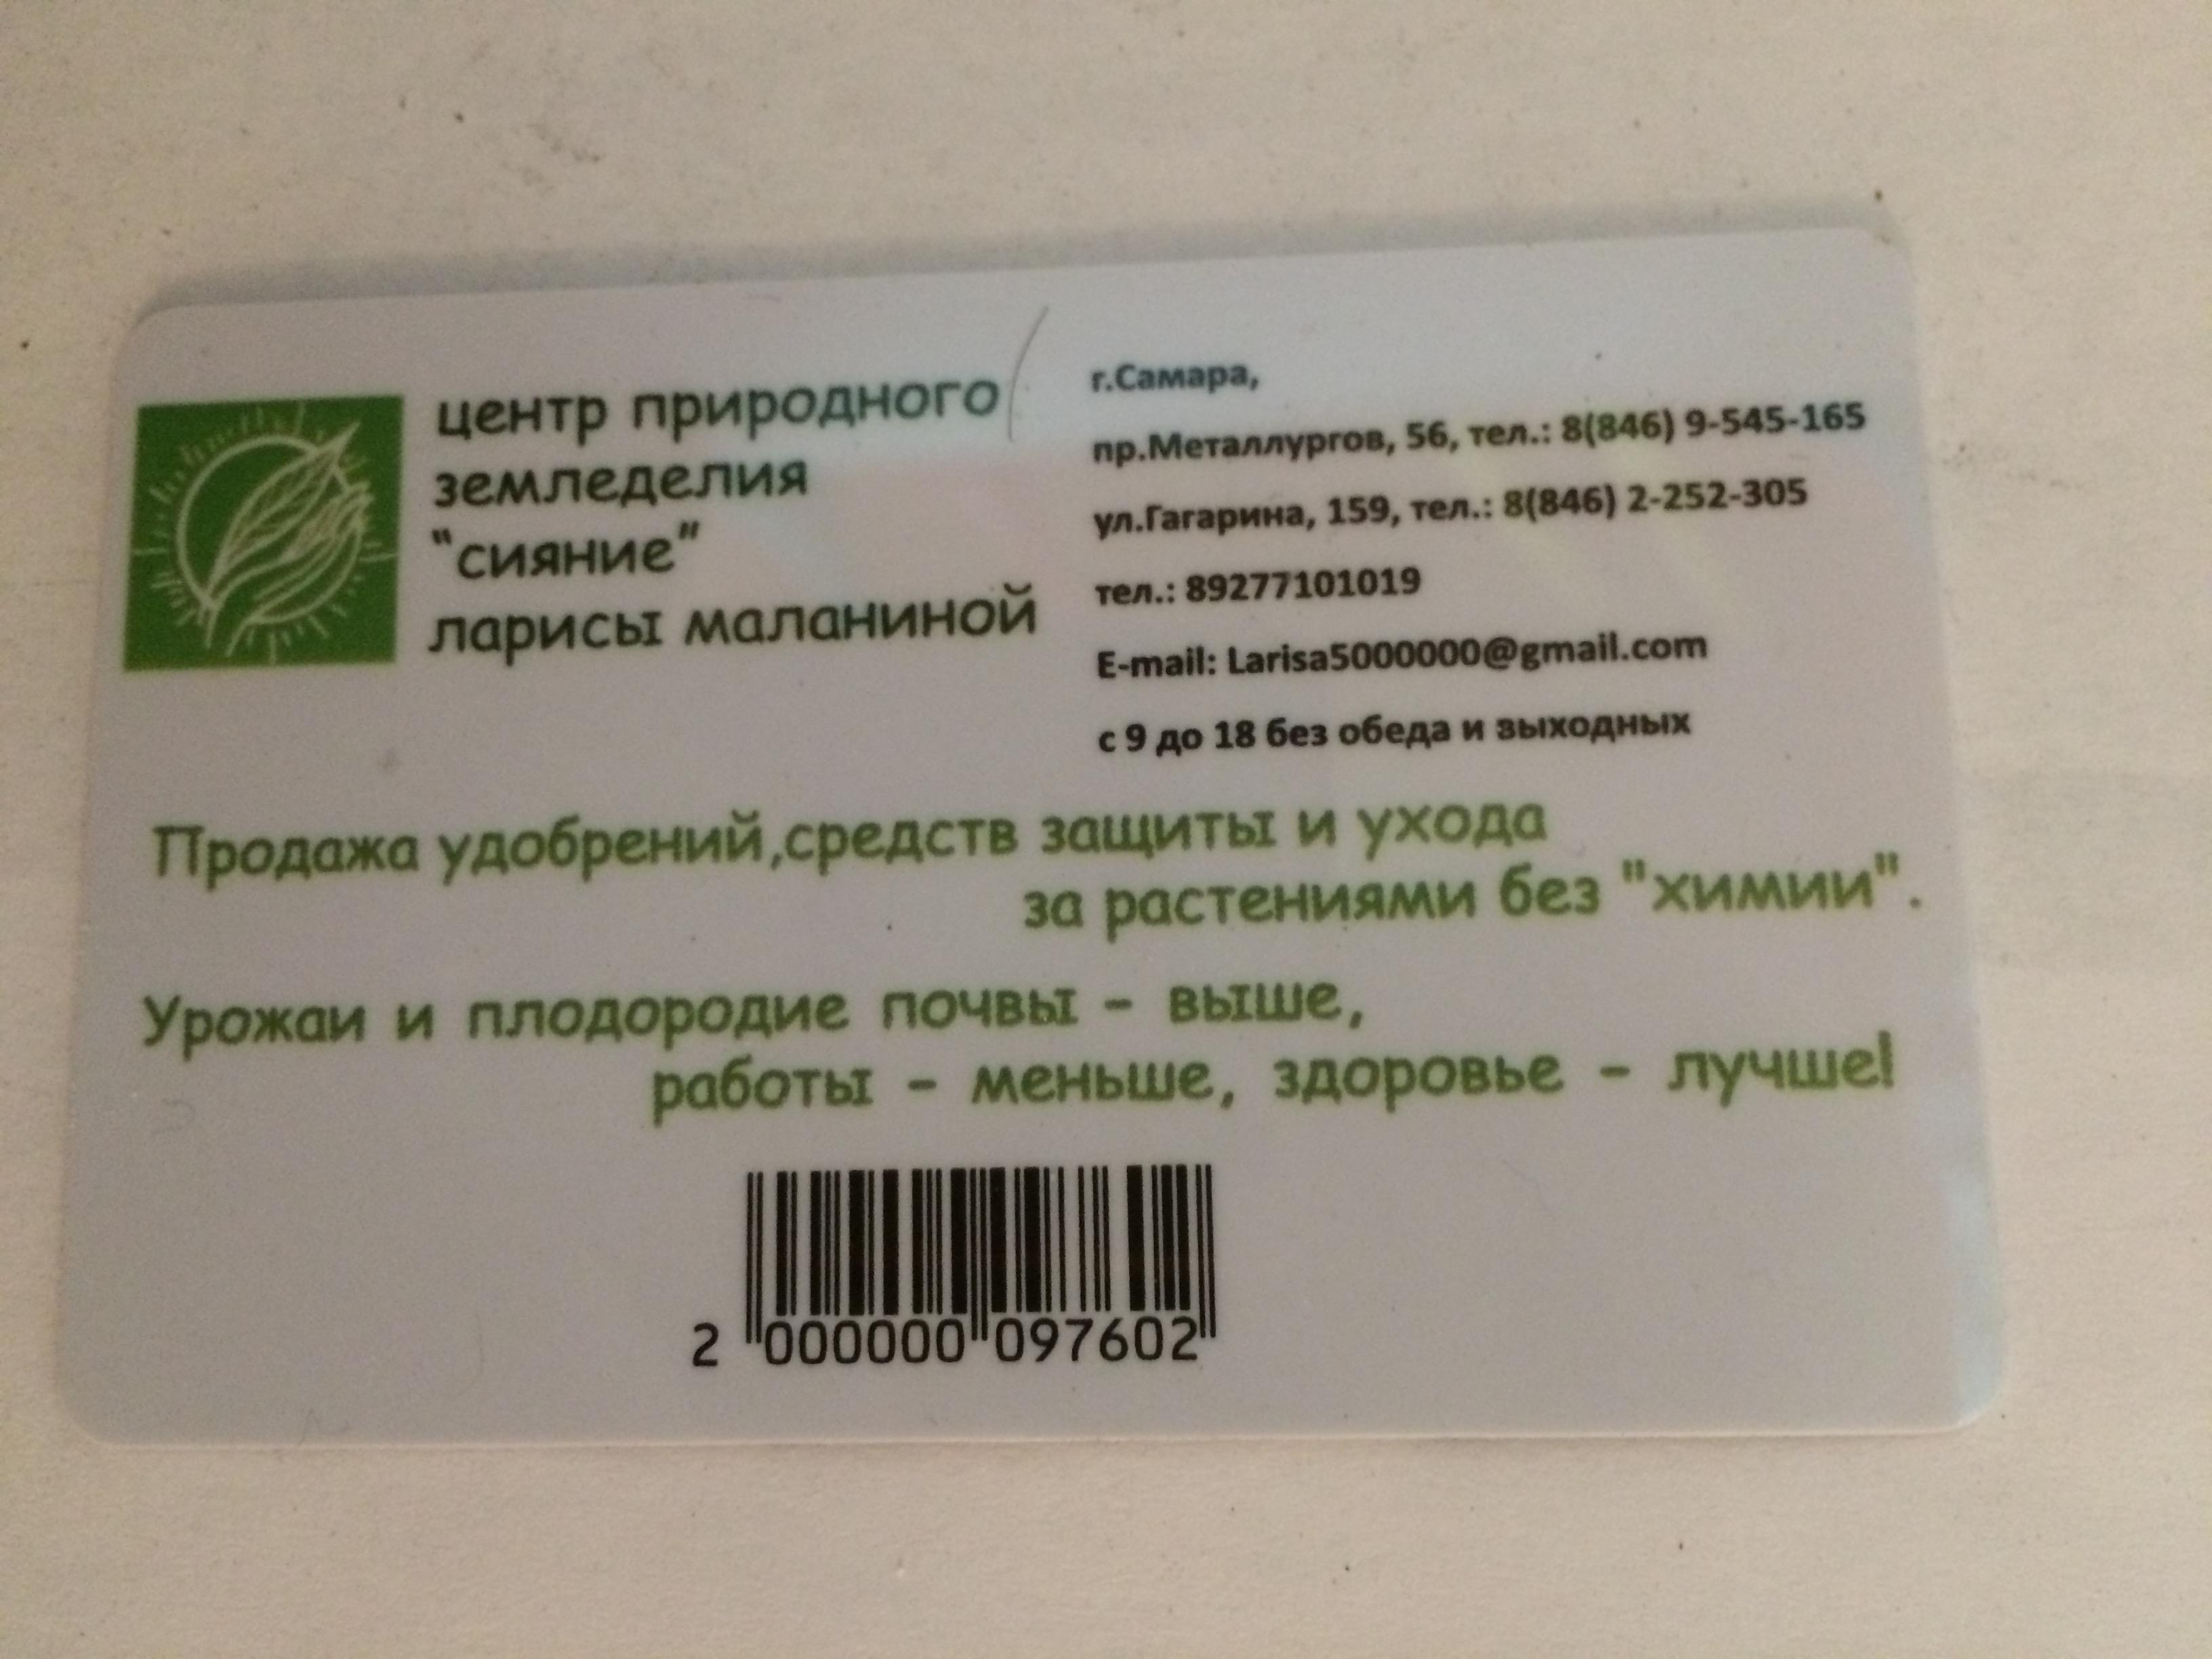 diskontnaya-karta (2)